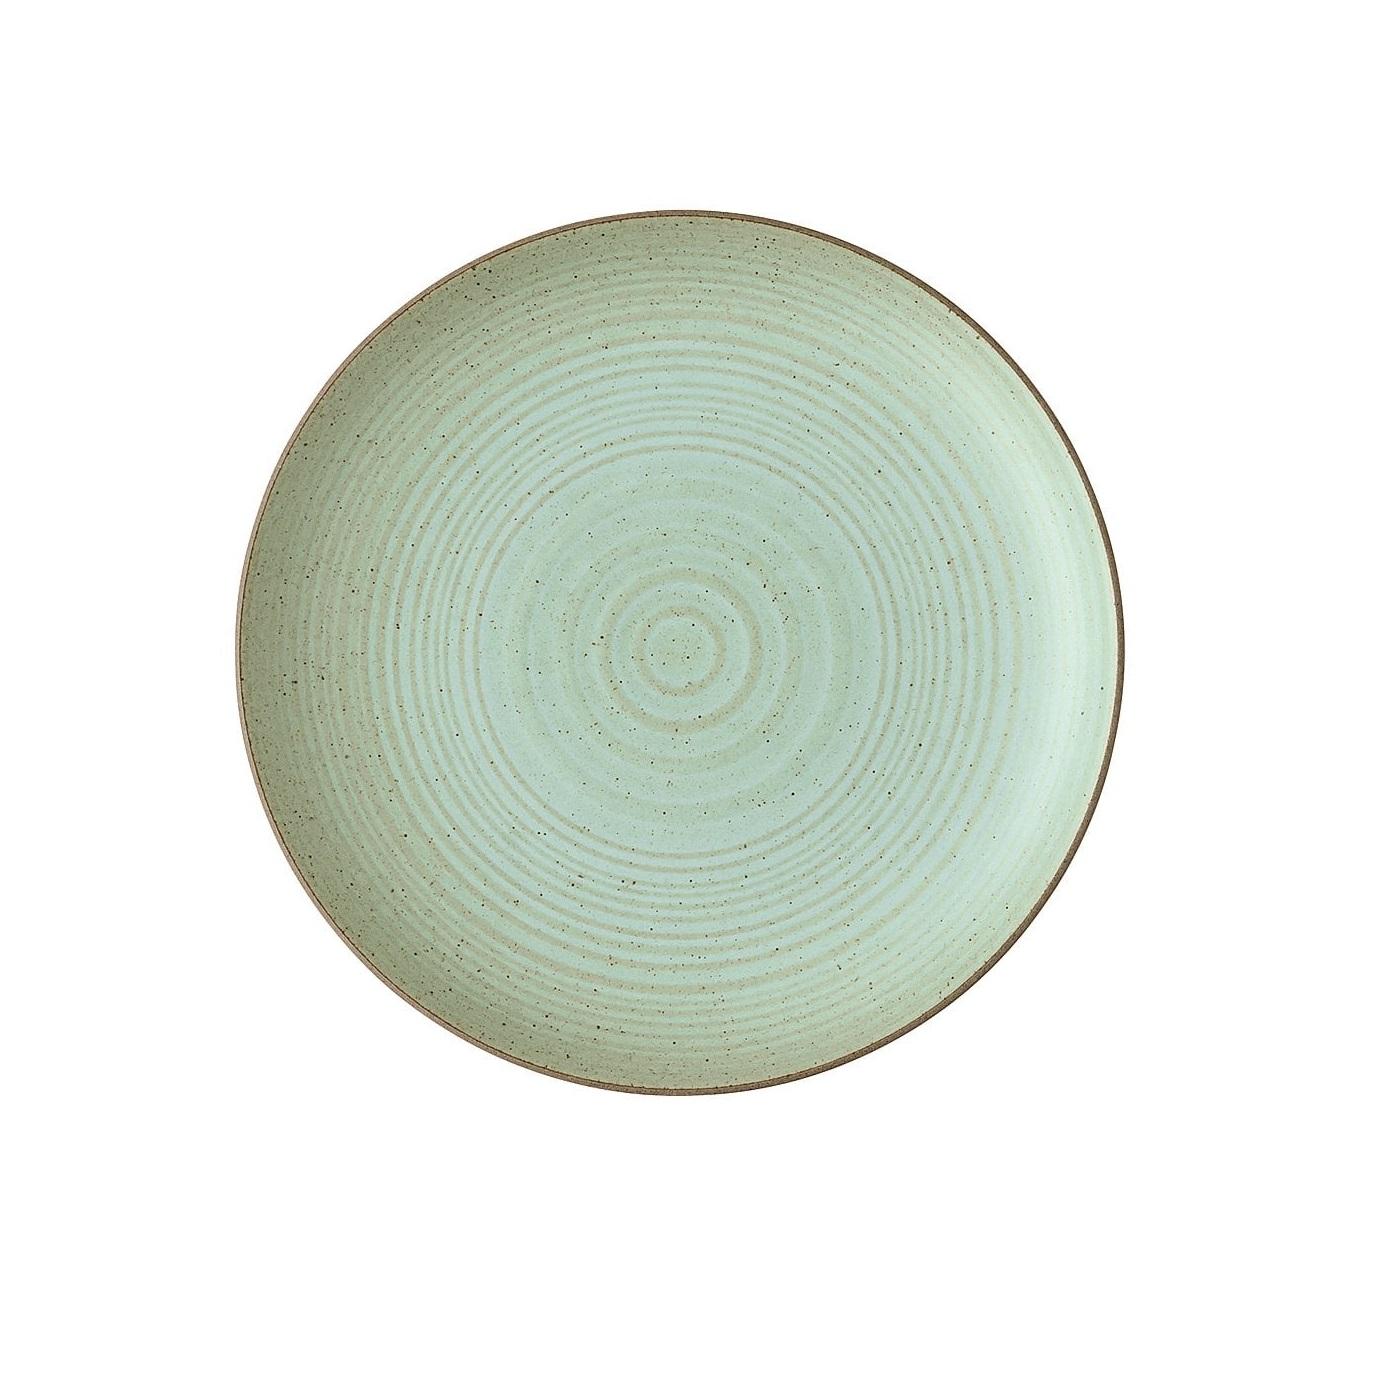 Онлайн каталог PROMENU: Тарелка для завтрака керамическая Thomas Nature, диаметр 22 см, серый                               21730-227072-60222